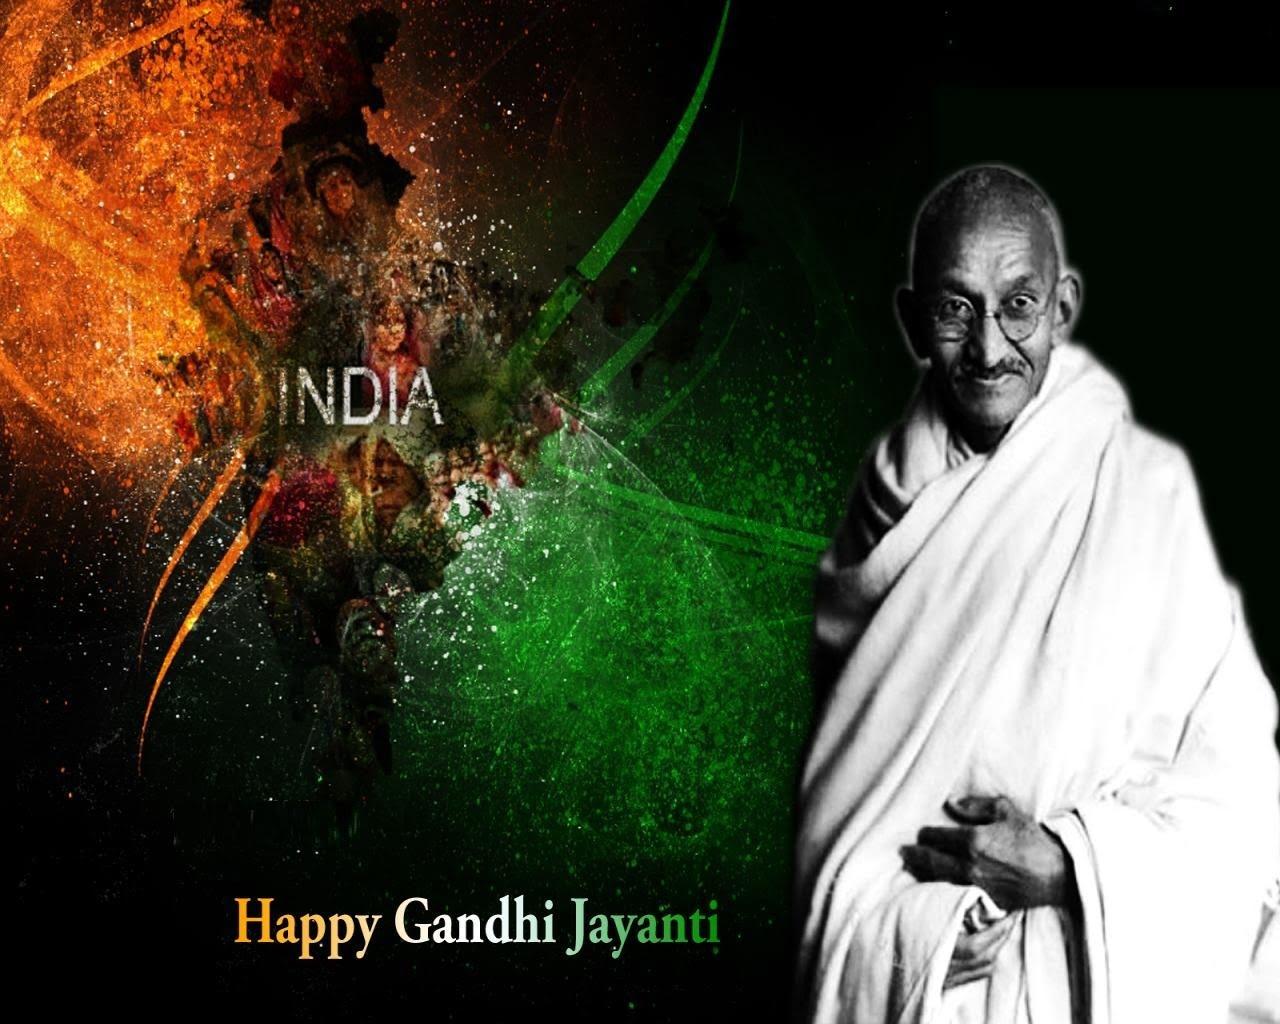 Happy Gandhi Jayanti 2019 Hd Pictures Free Download